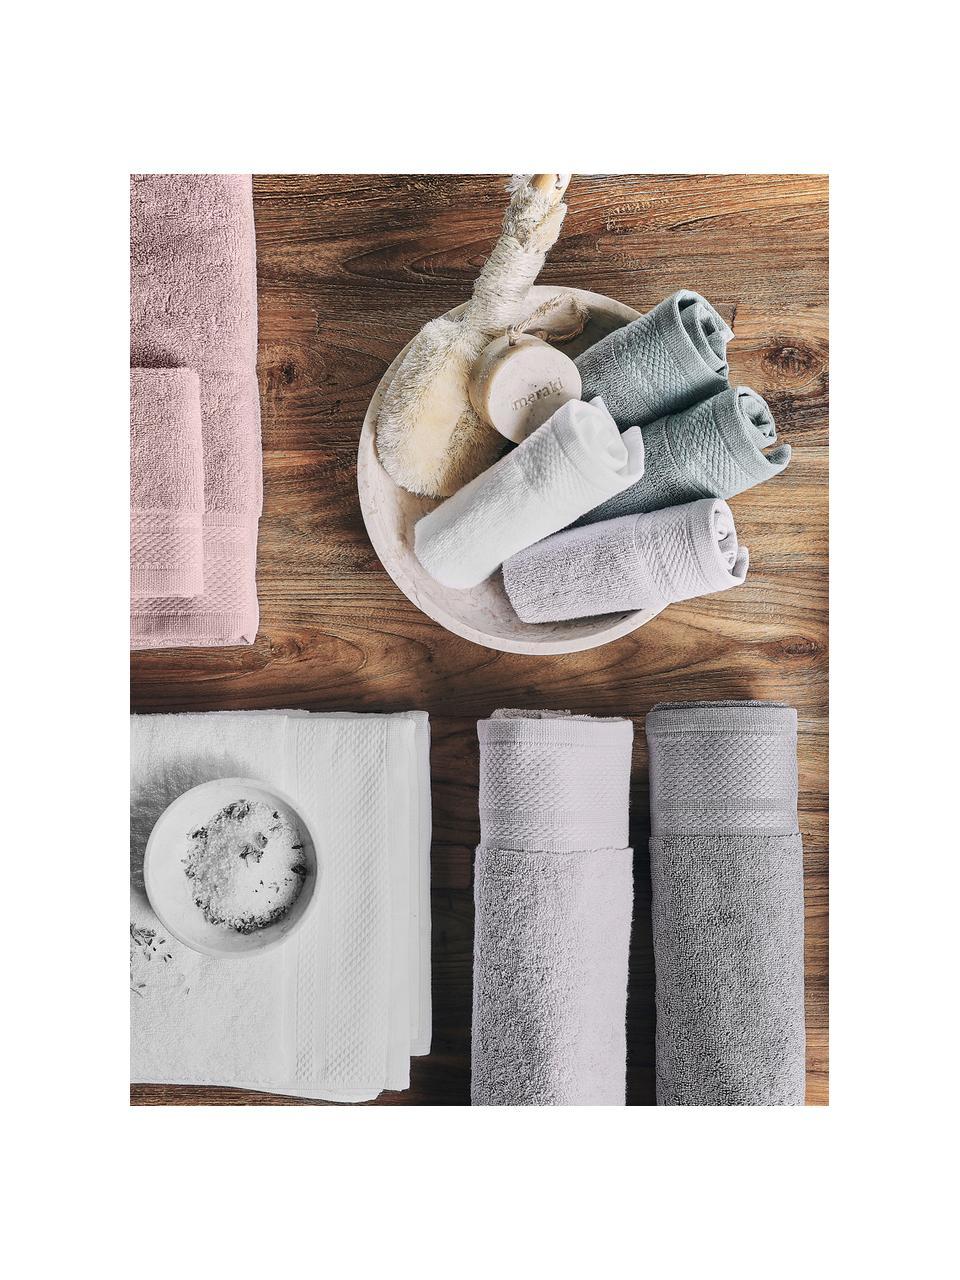 Set 3 asciugamani con bordo decorativo classico Premium, Rosa cipria, Set in varie misure